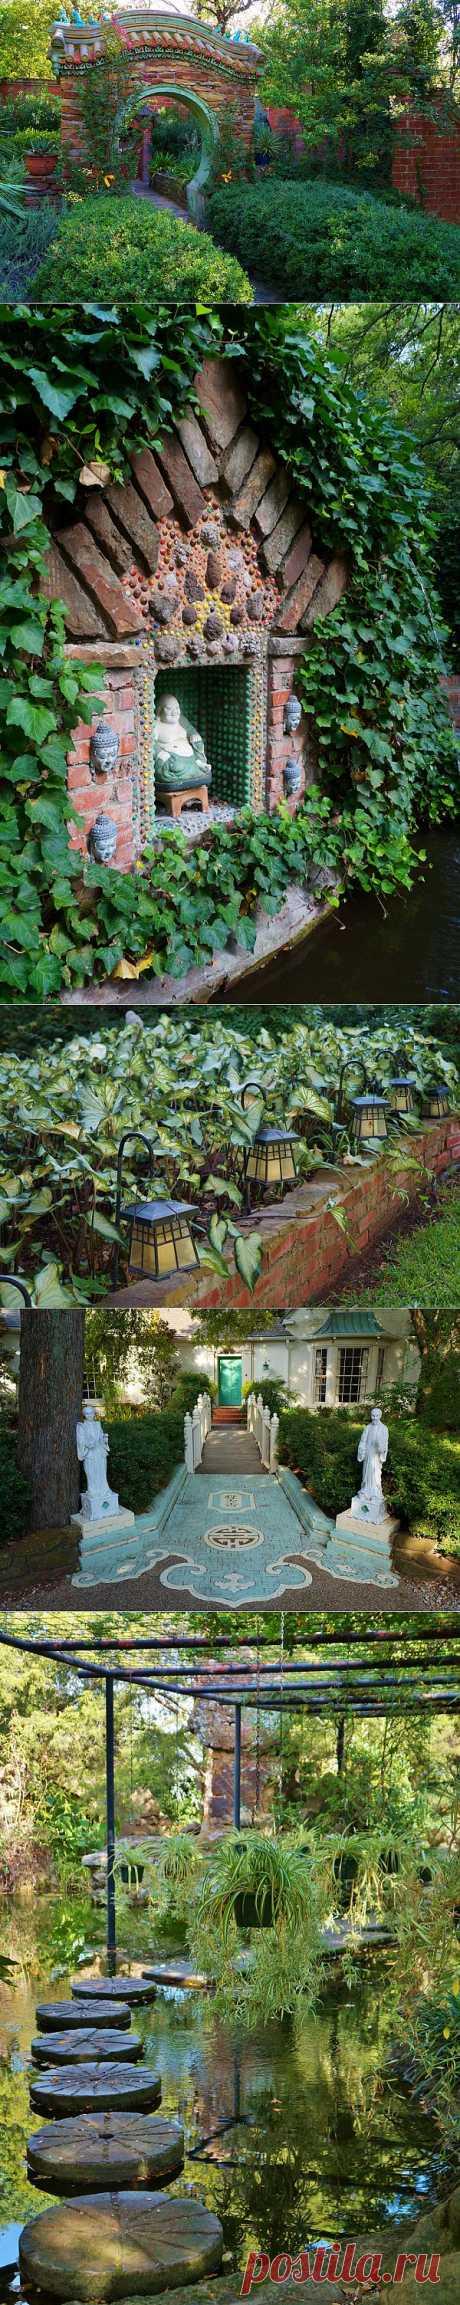 Сады Чандора (Chandor Gardens). США.